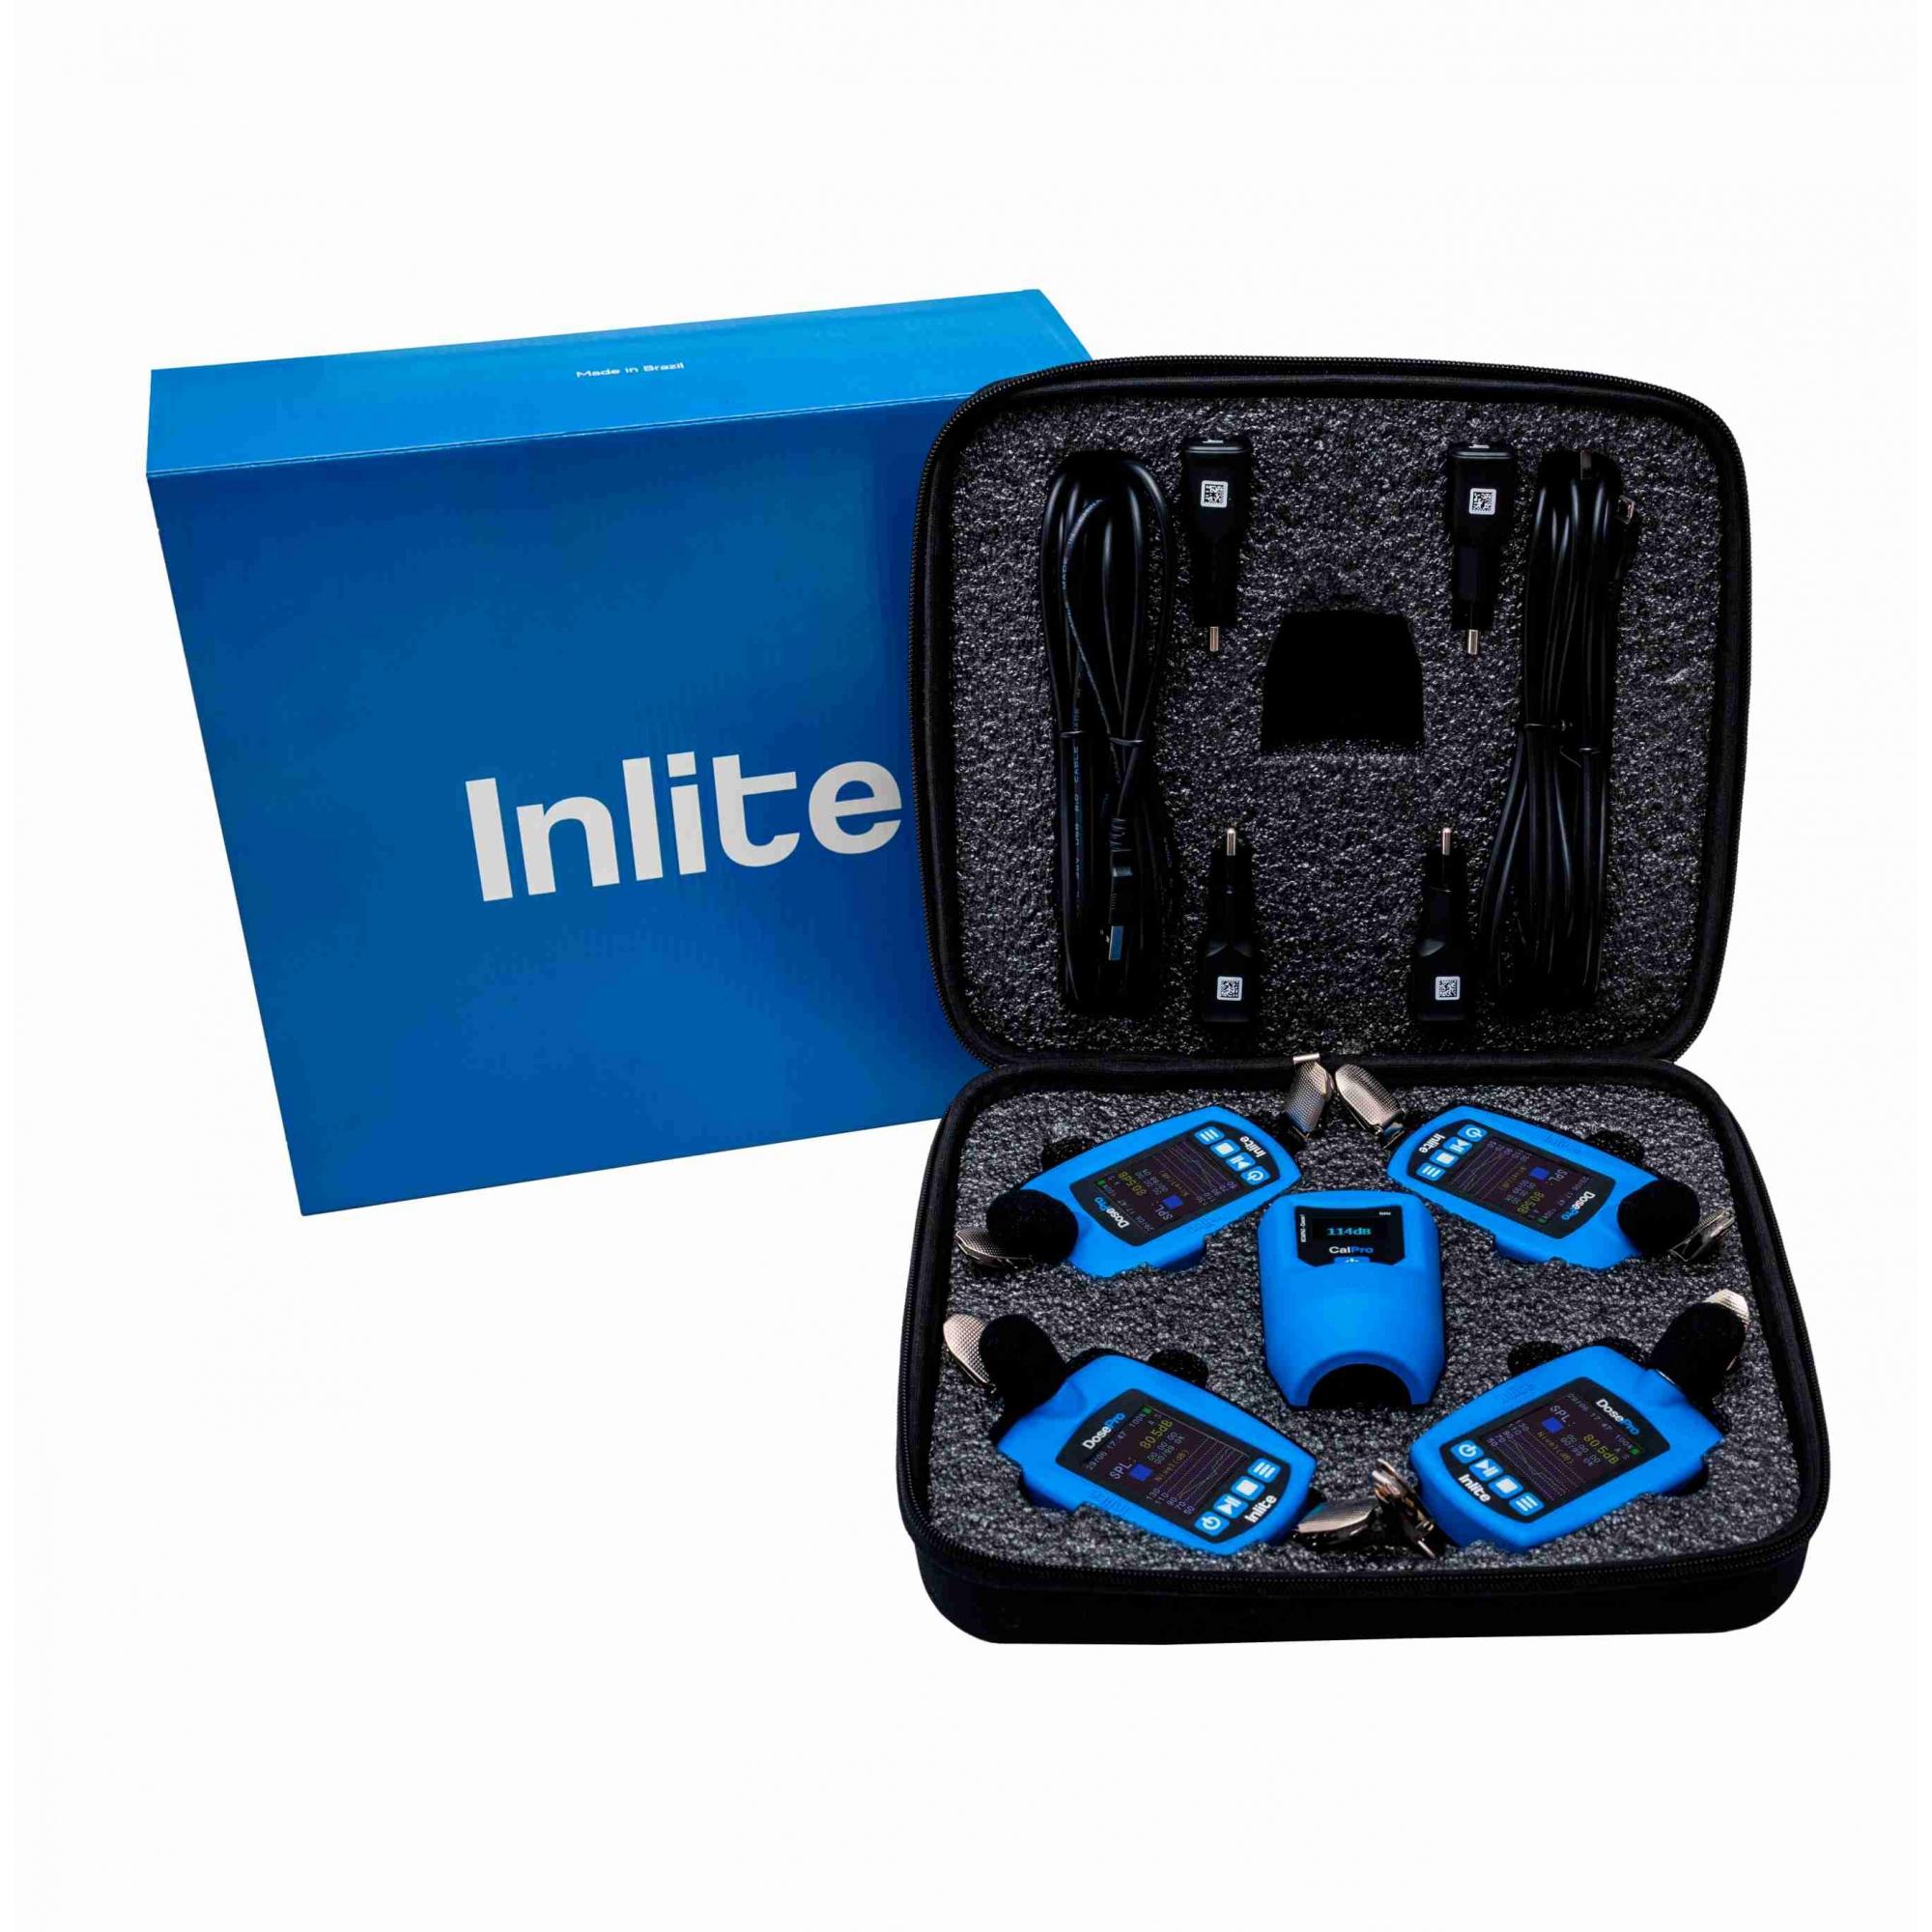 Kit para Higiene Ocupacional composto por 4 dosímetros de ruído DoseMax, 1 calibrador acústico CalPro e estojo para transporte